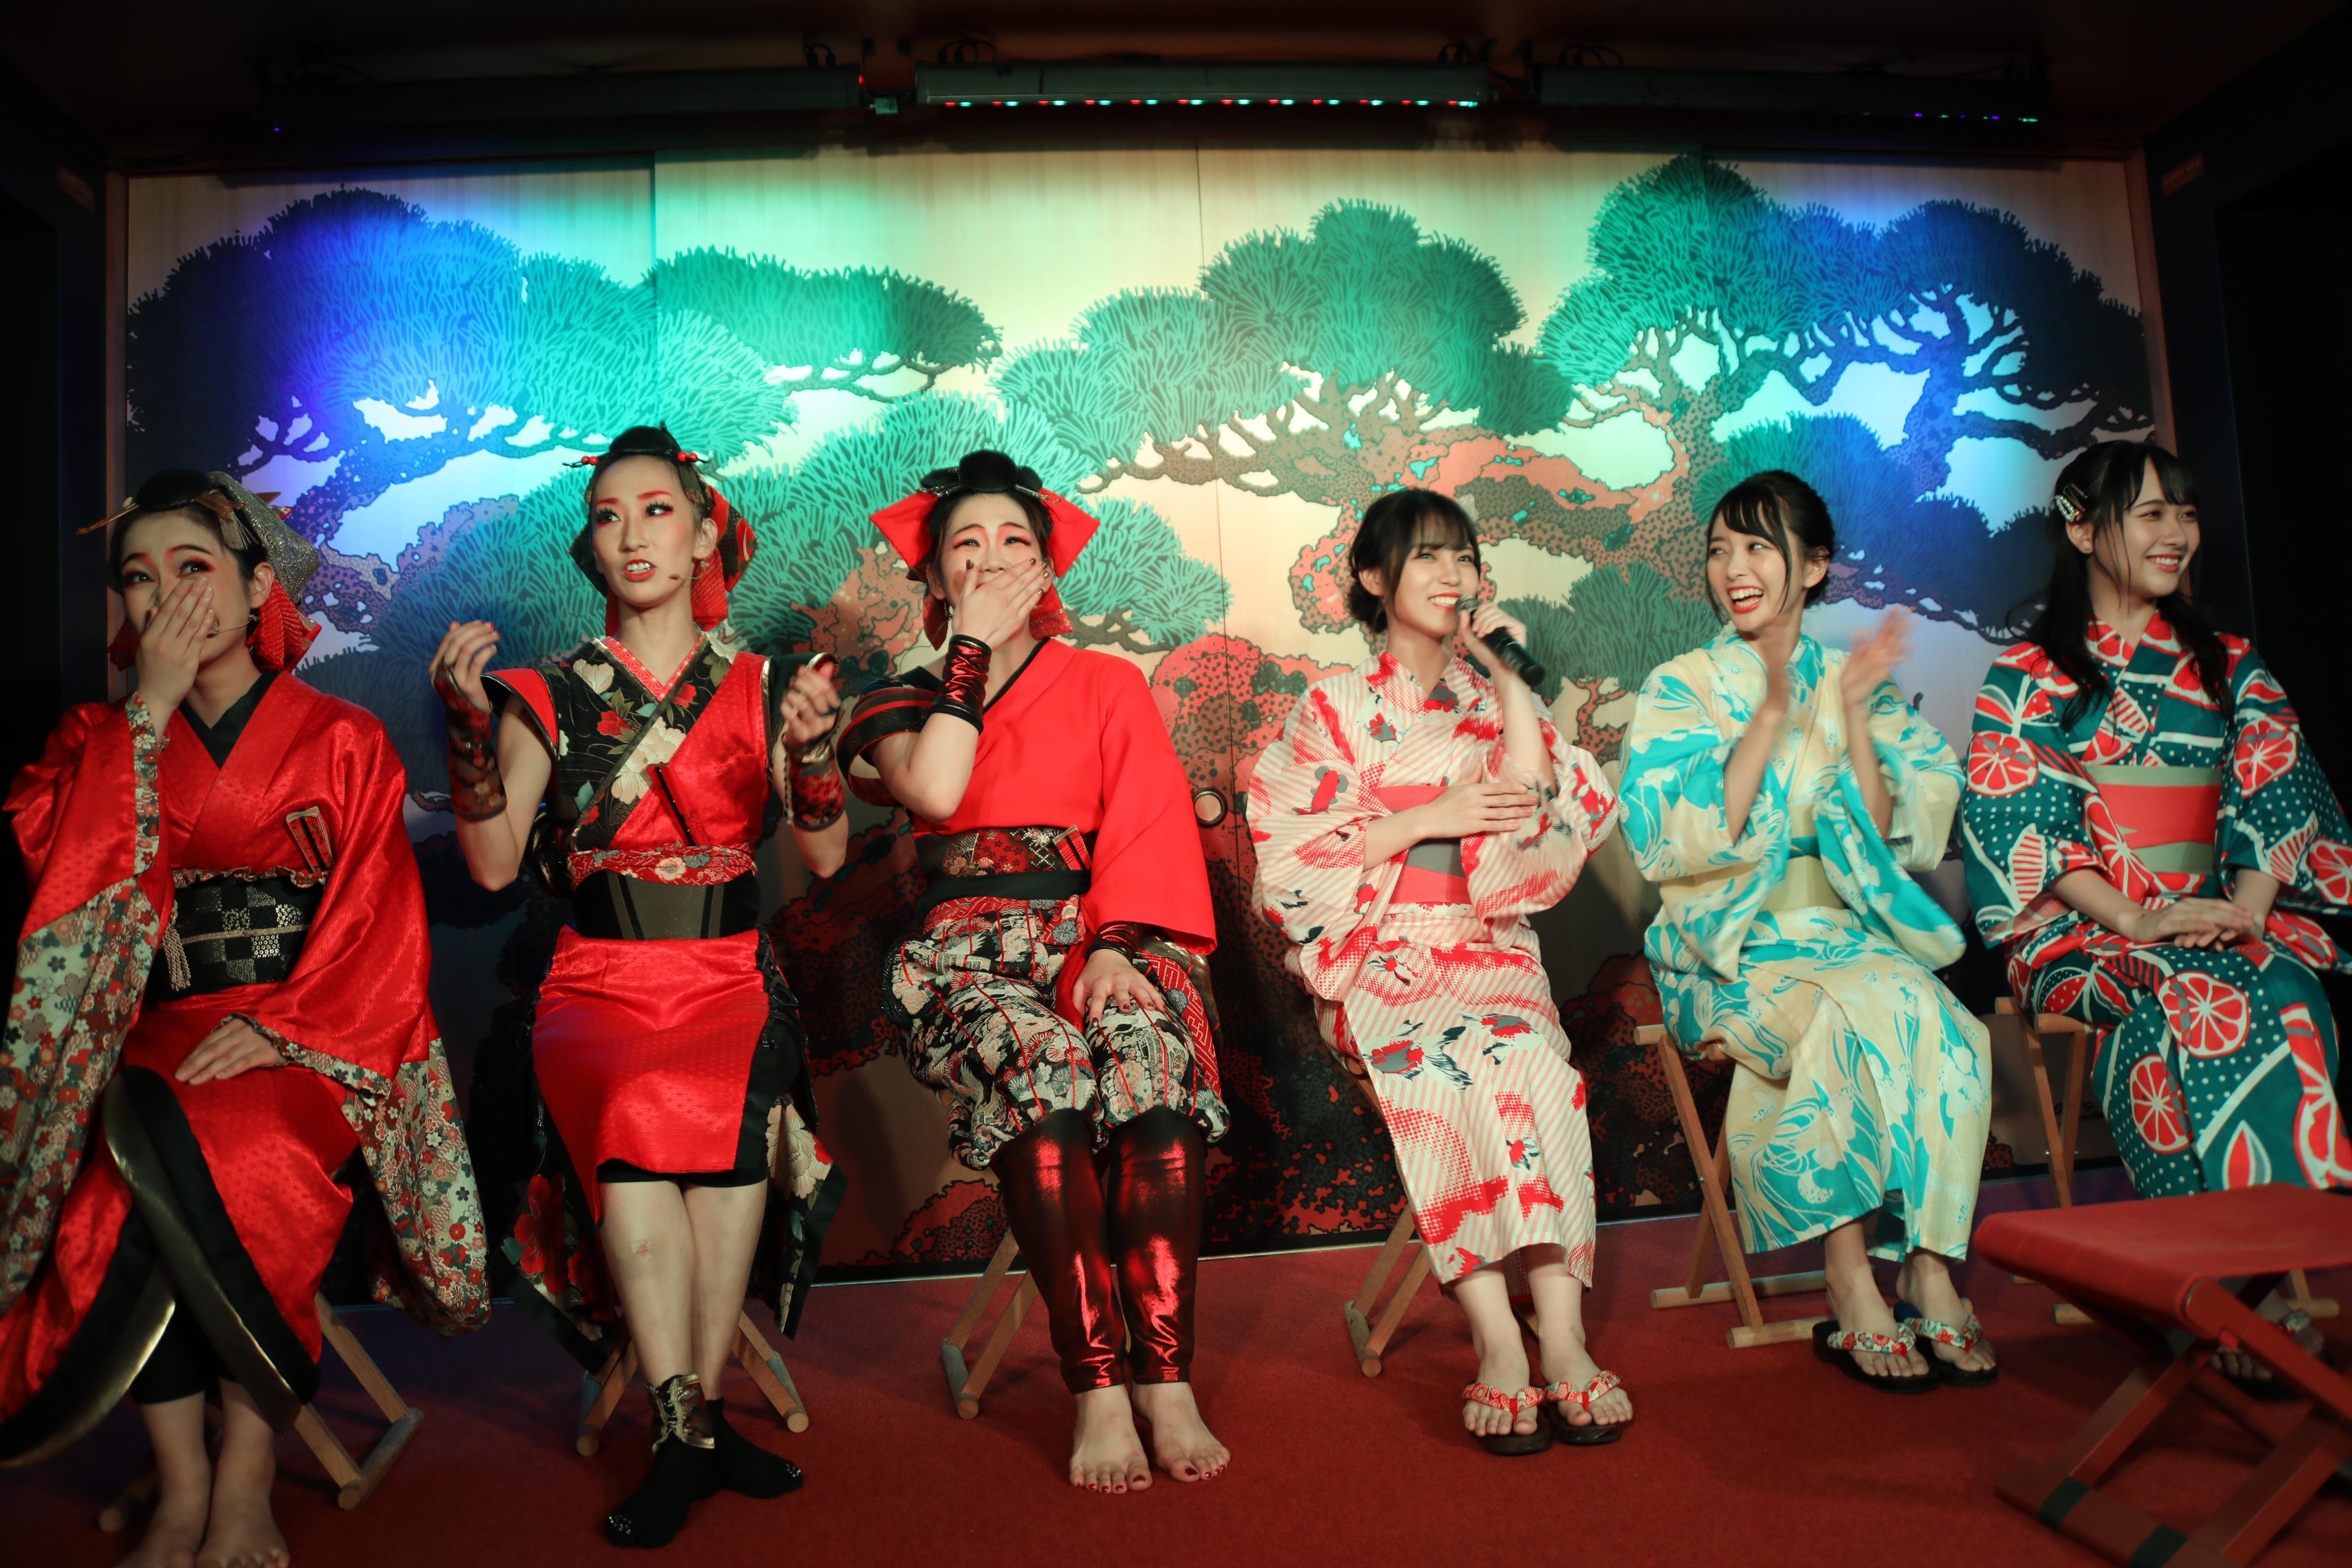 WAGAKUのメンバーとステージでトークを展開する岩田陽菜・石田みなみ・石田千穂